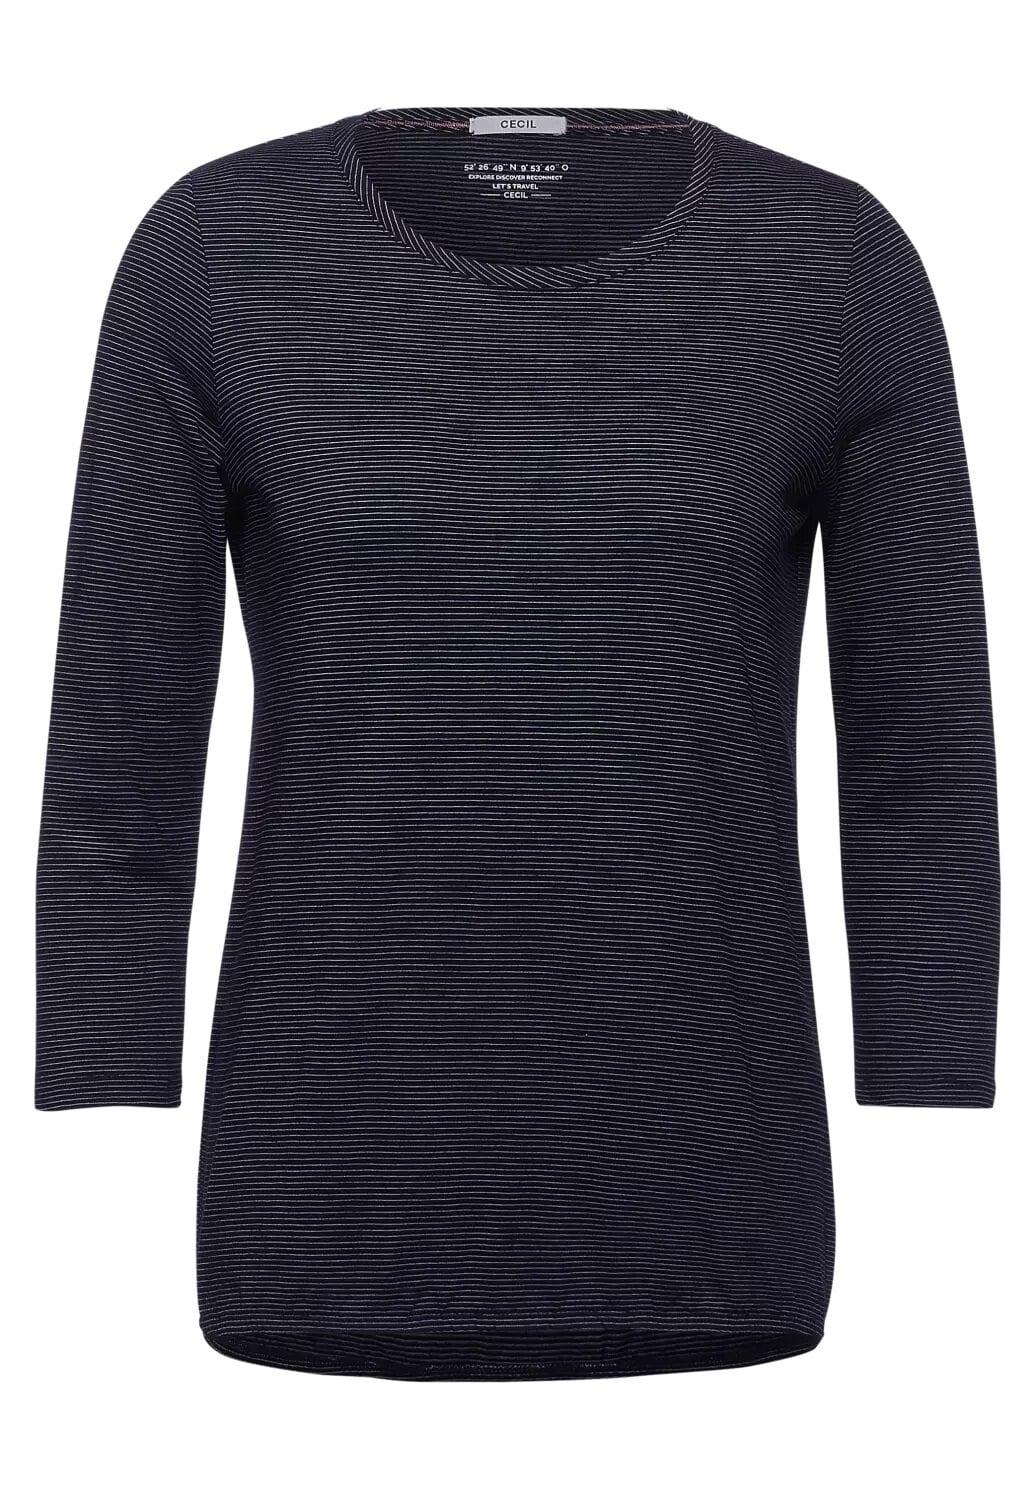 Stripe T-shirt - Grey